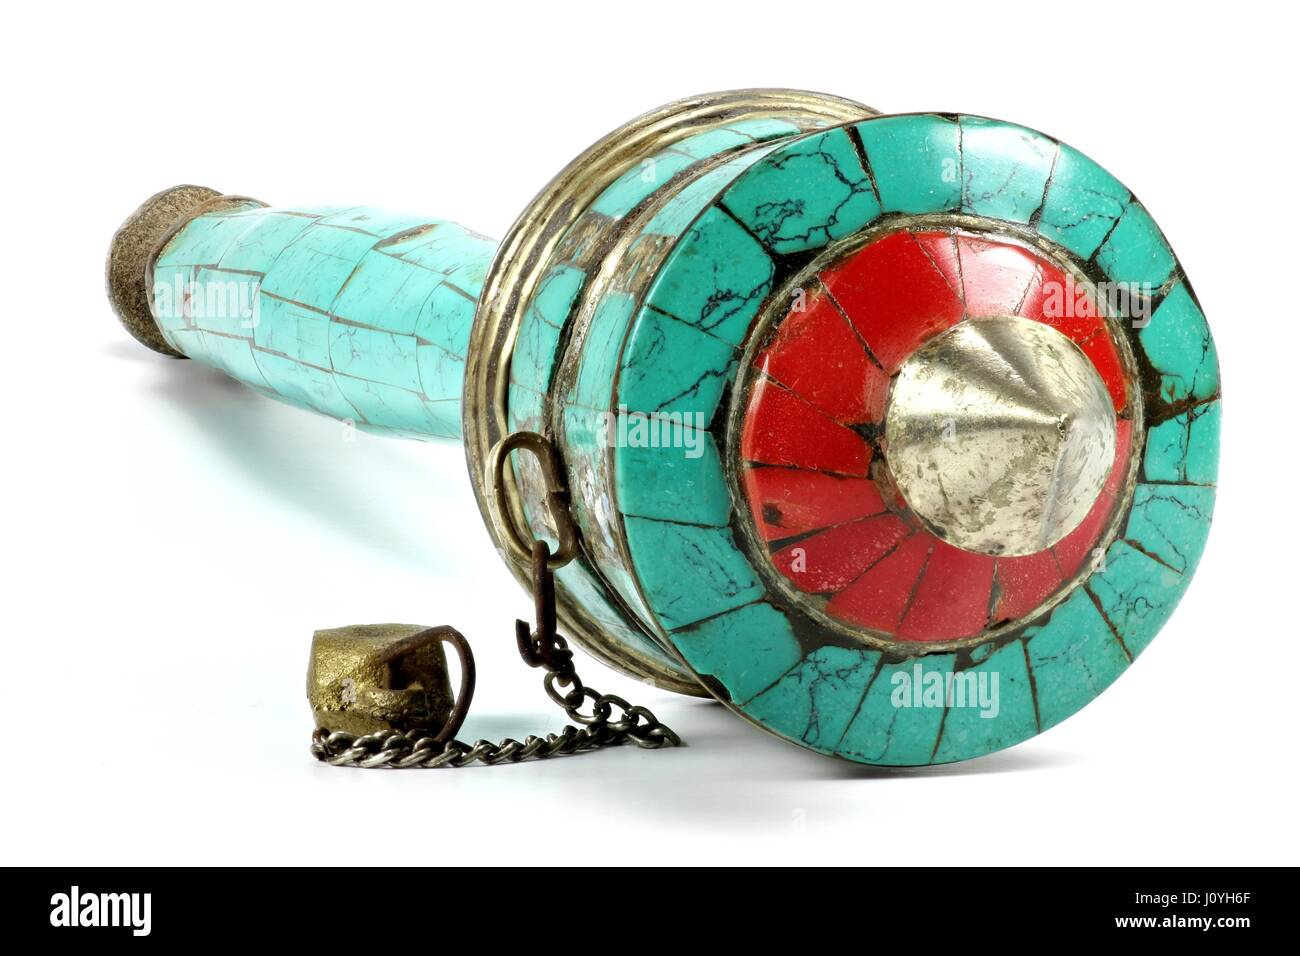 Tibetan prayer wheel isolated on white background - Stock Image